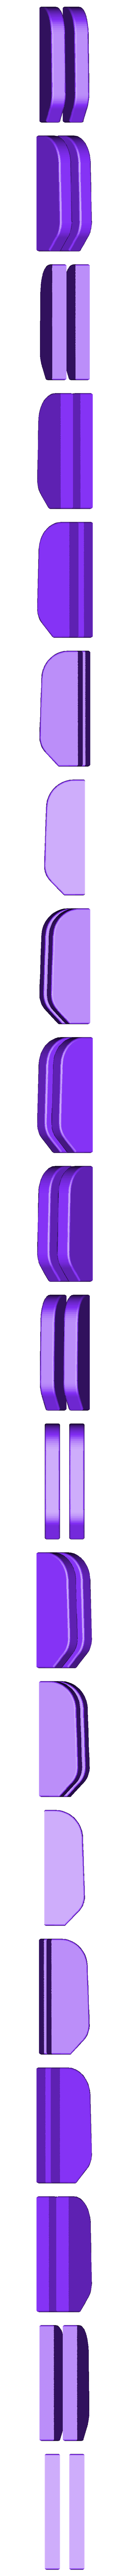 BlackKeys.stl Download free STL file Piano Keys Mobile Dock • 3D printer object, Double_Alfa_3D